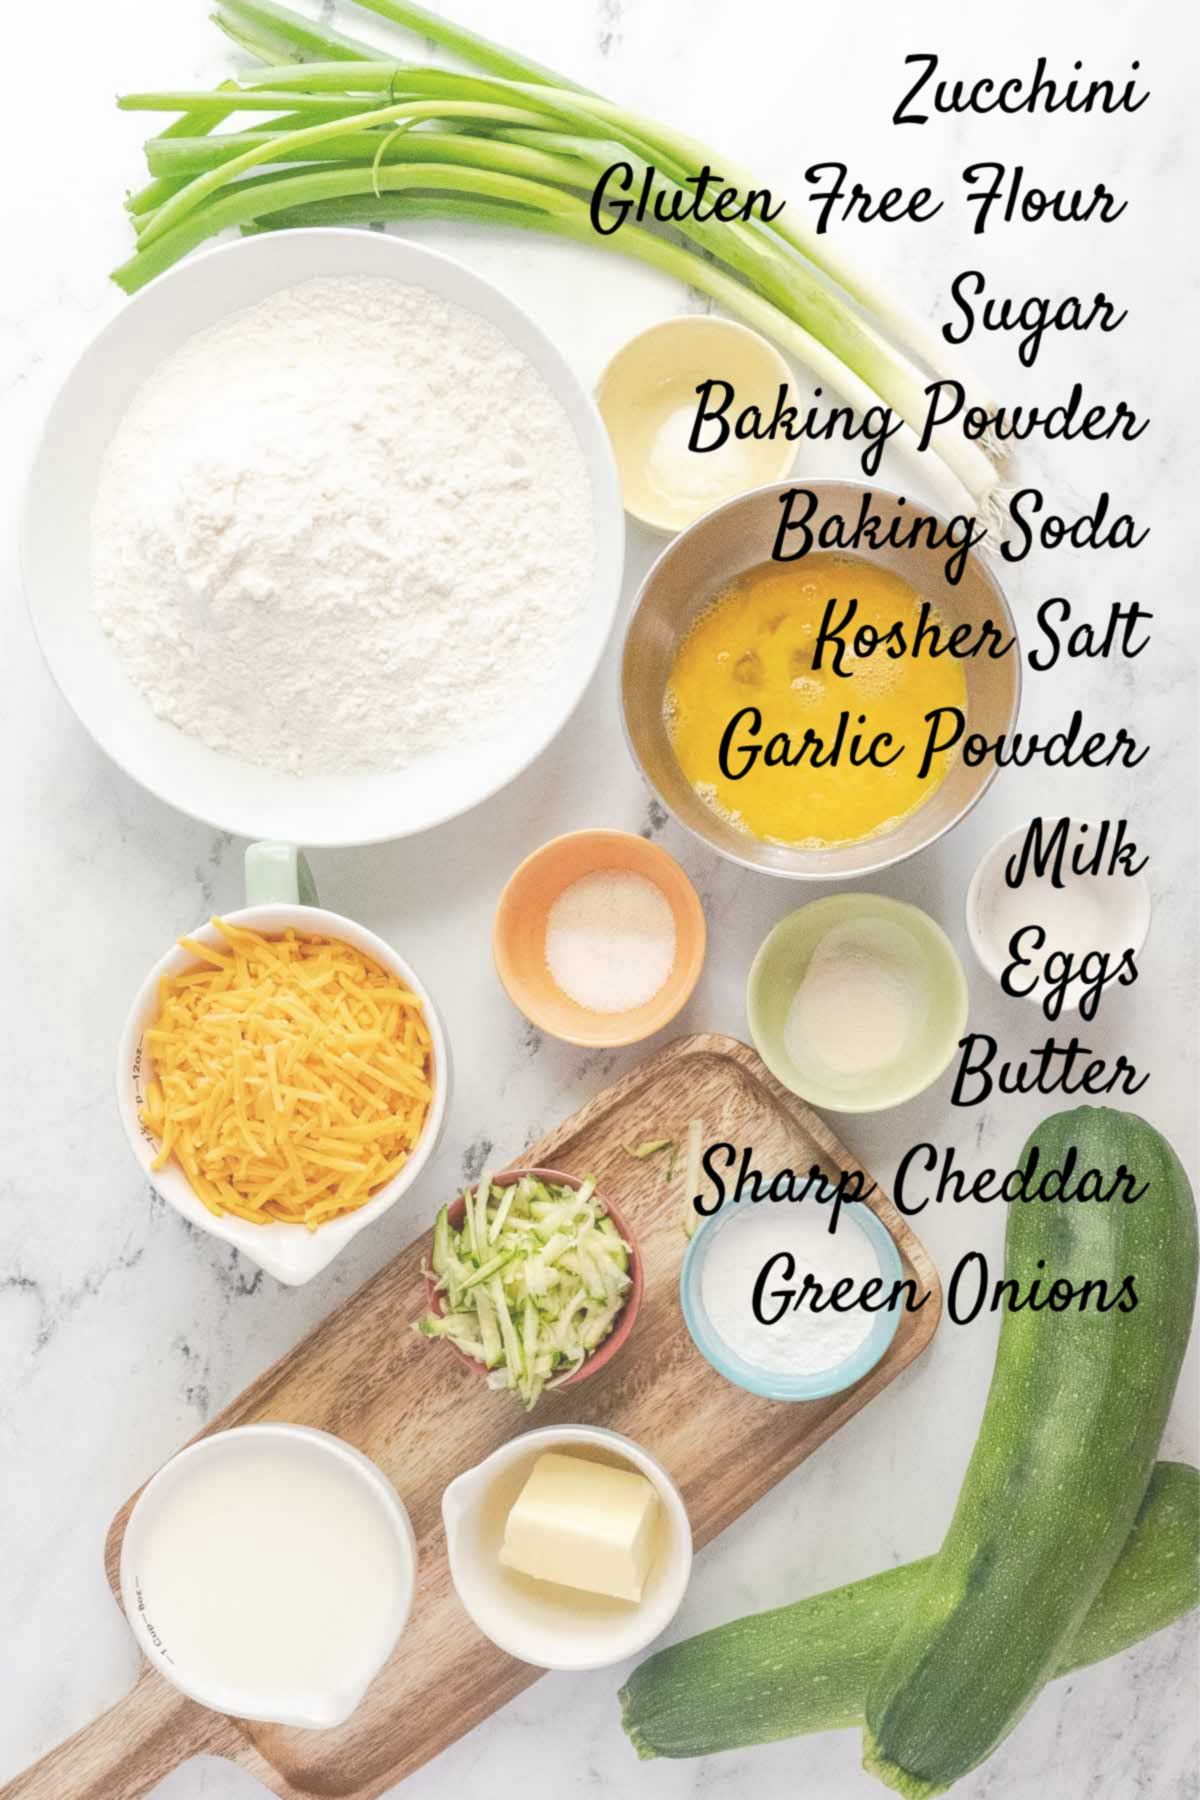 gluten free zucchini bread ingredients on a counter